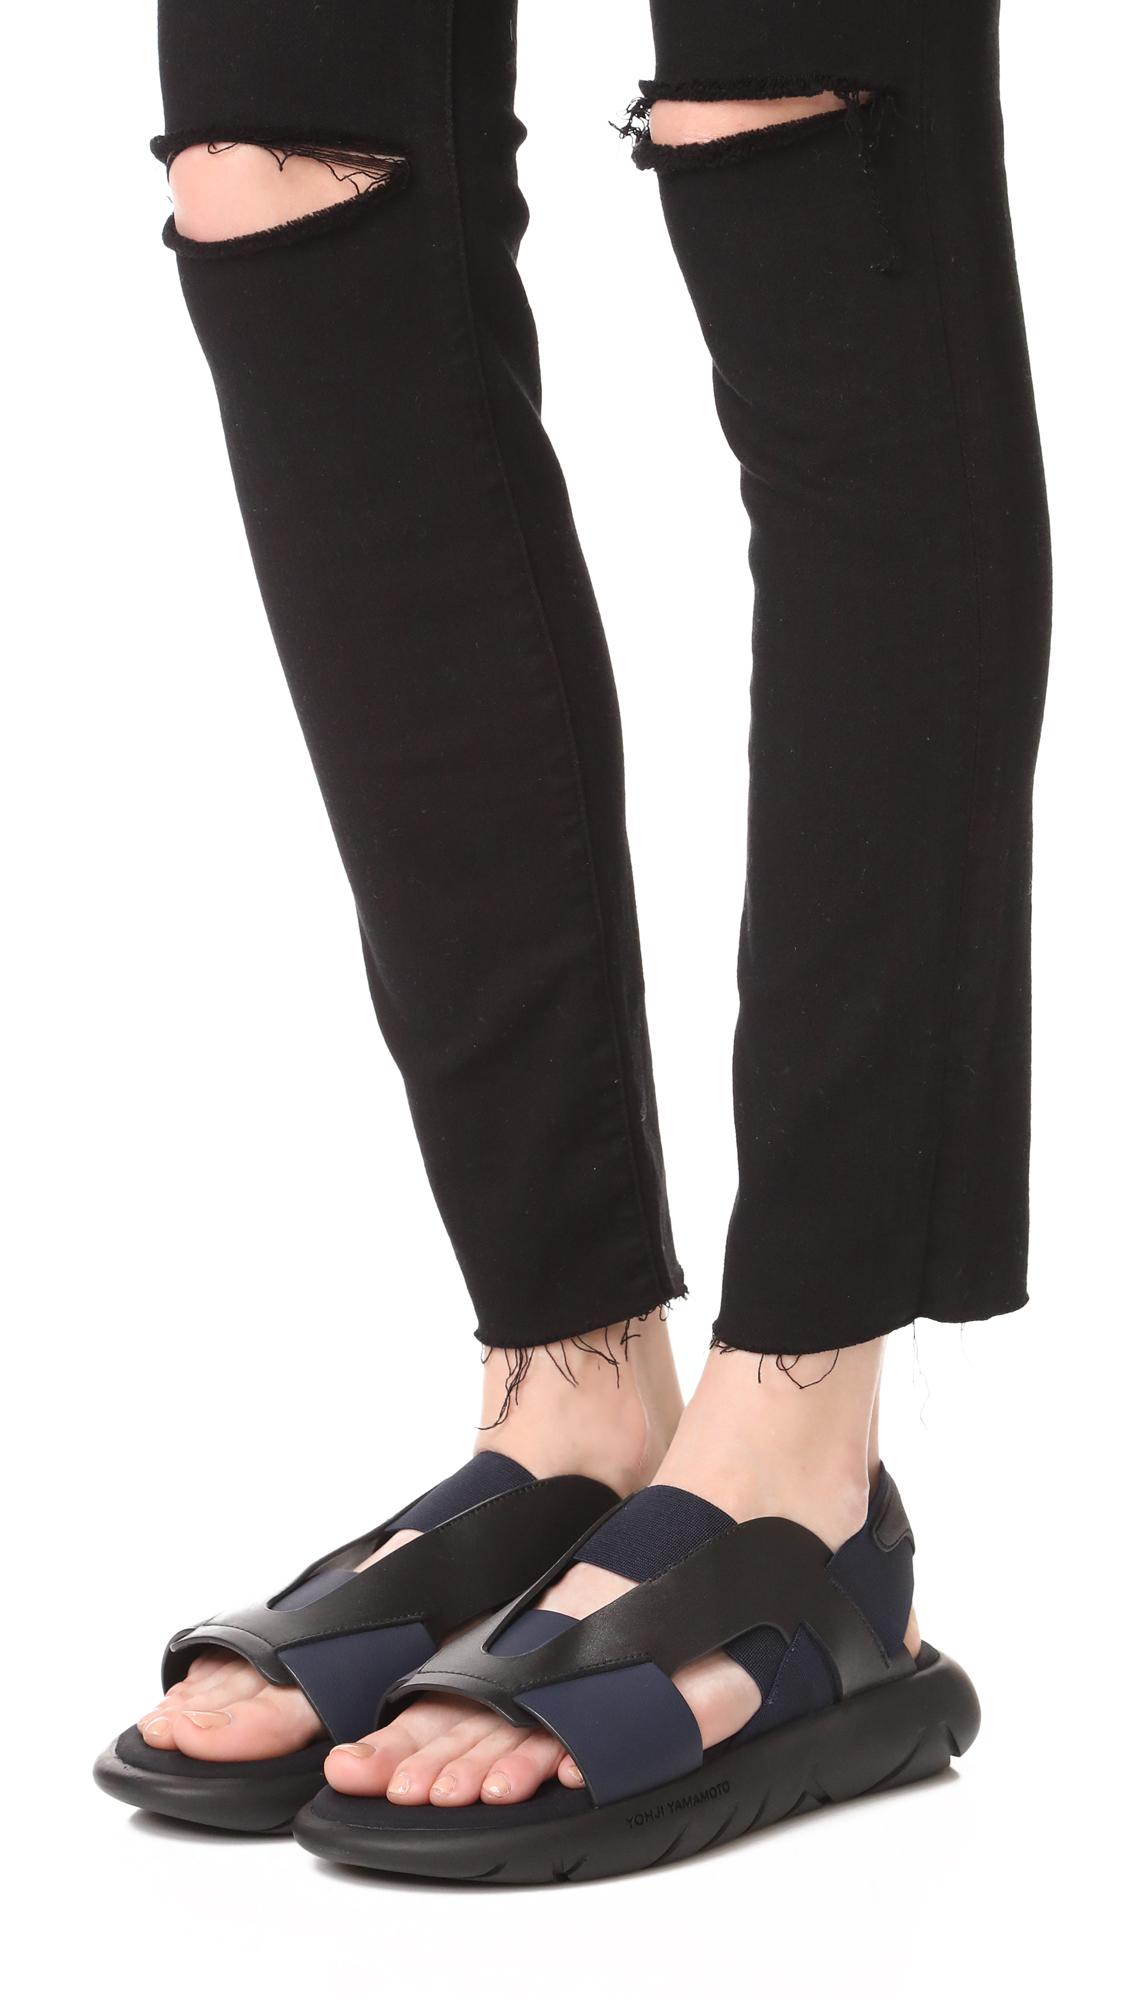 e248e3c8d Y-3 Y-3 Qasa Elle Sandals